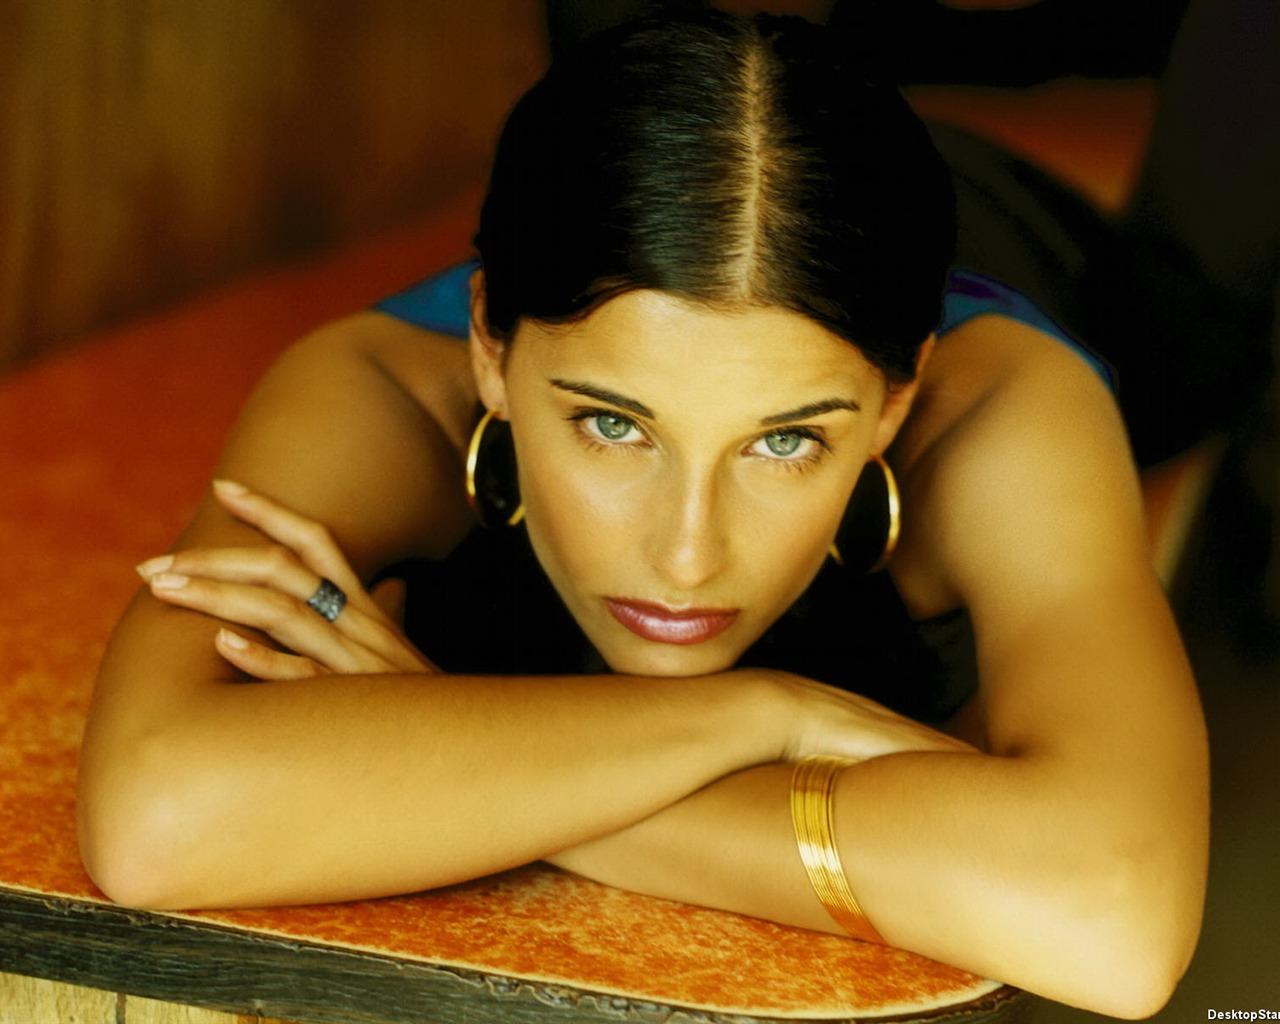 Nelly Furtado #010 - 1280x1024 Wallpaper Download